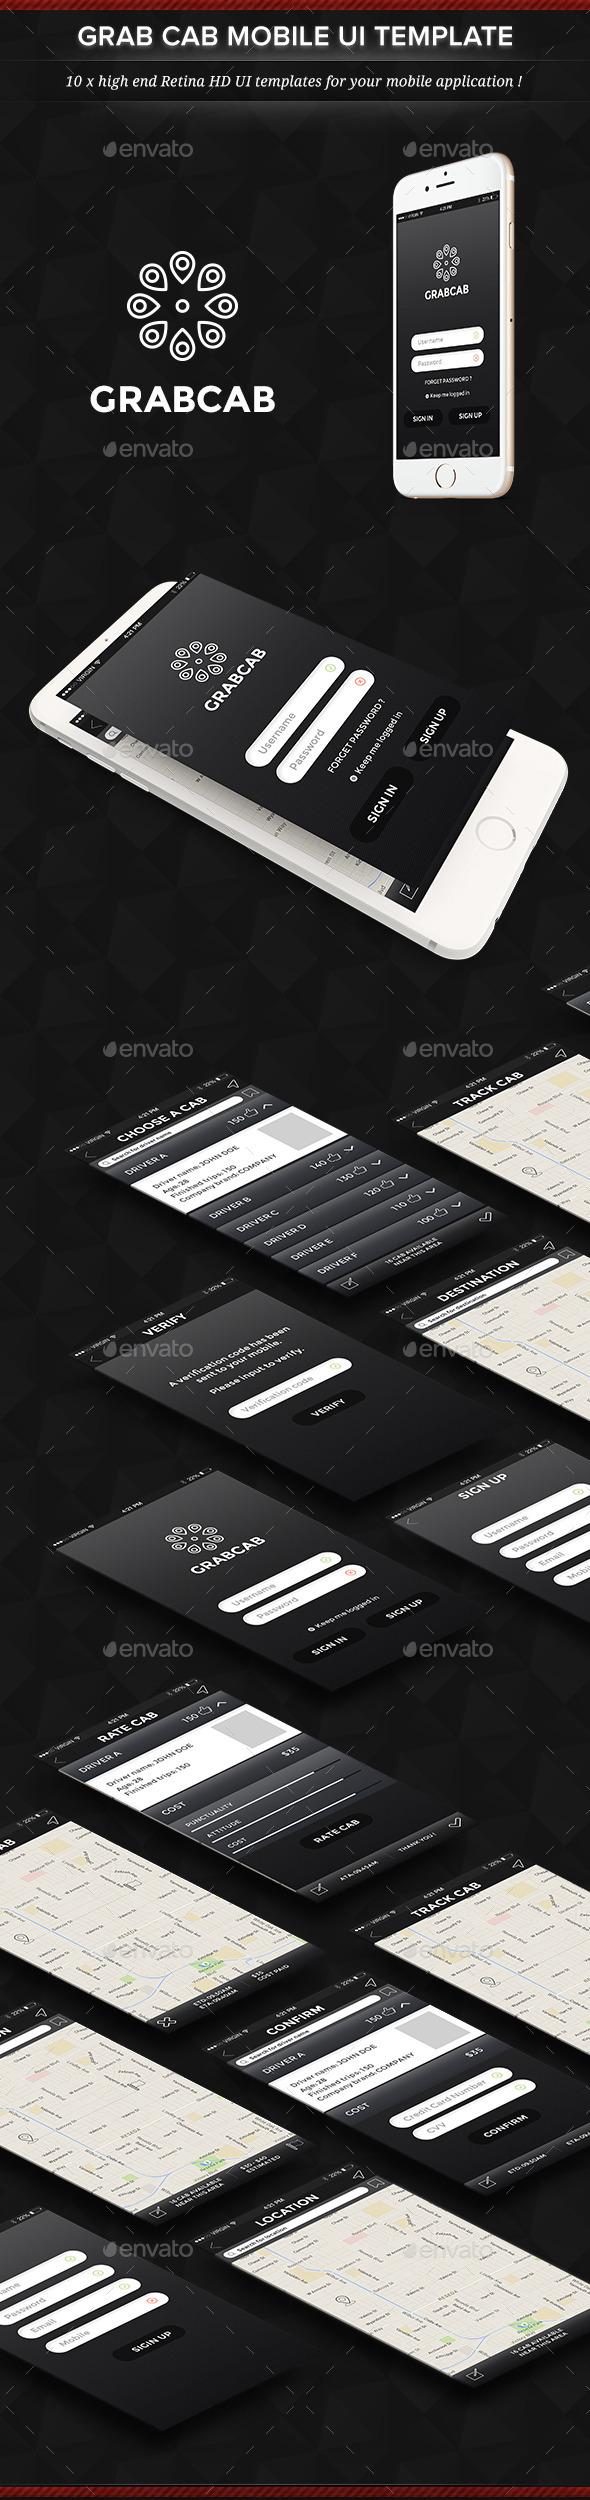 Grab Cab Mobile App User Interface Set - User Interfaces Web Elements